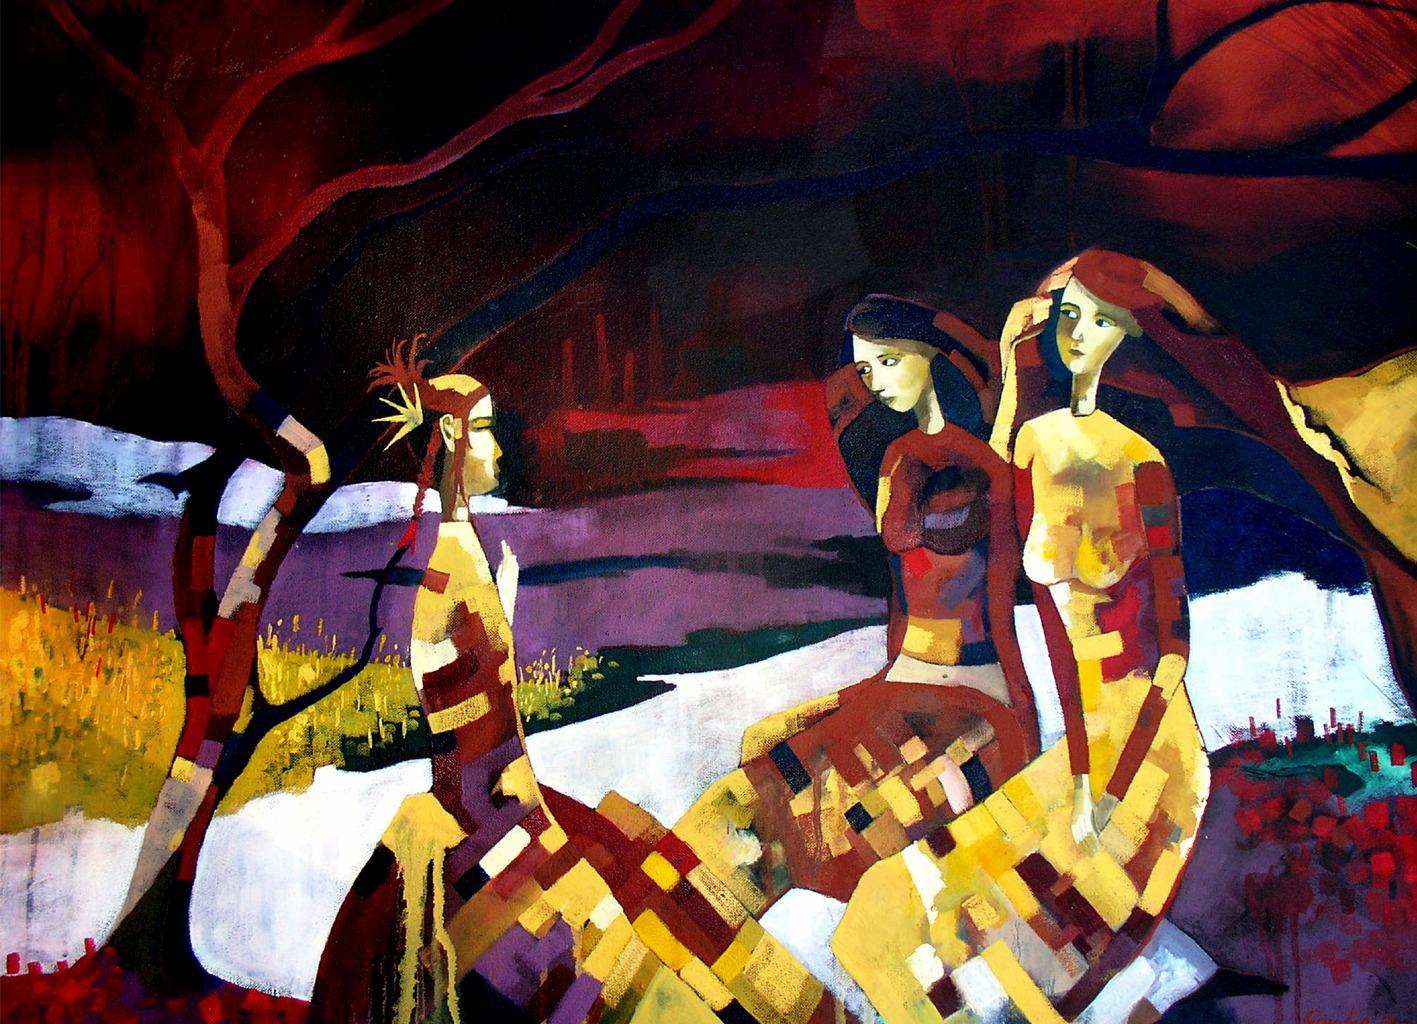 Homage Oil painting By Scottish Artist Gordon Brown